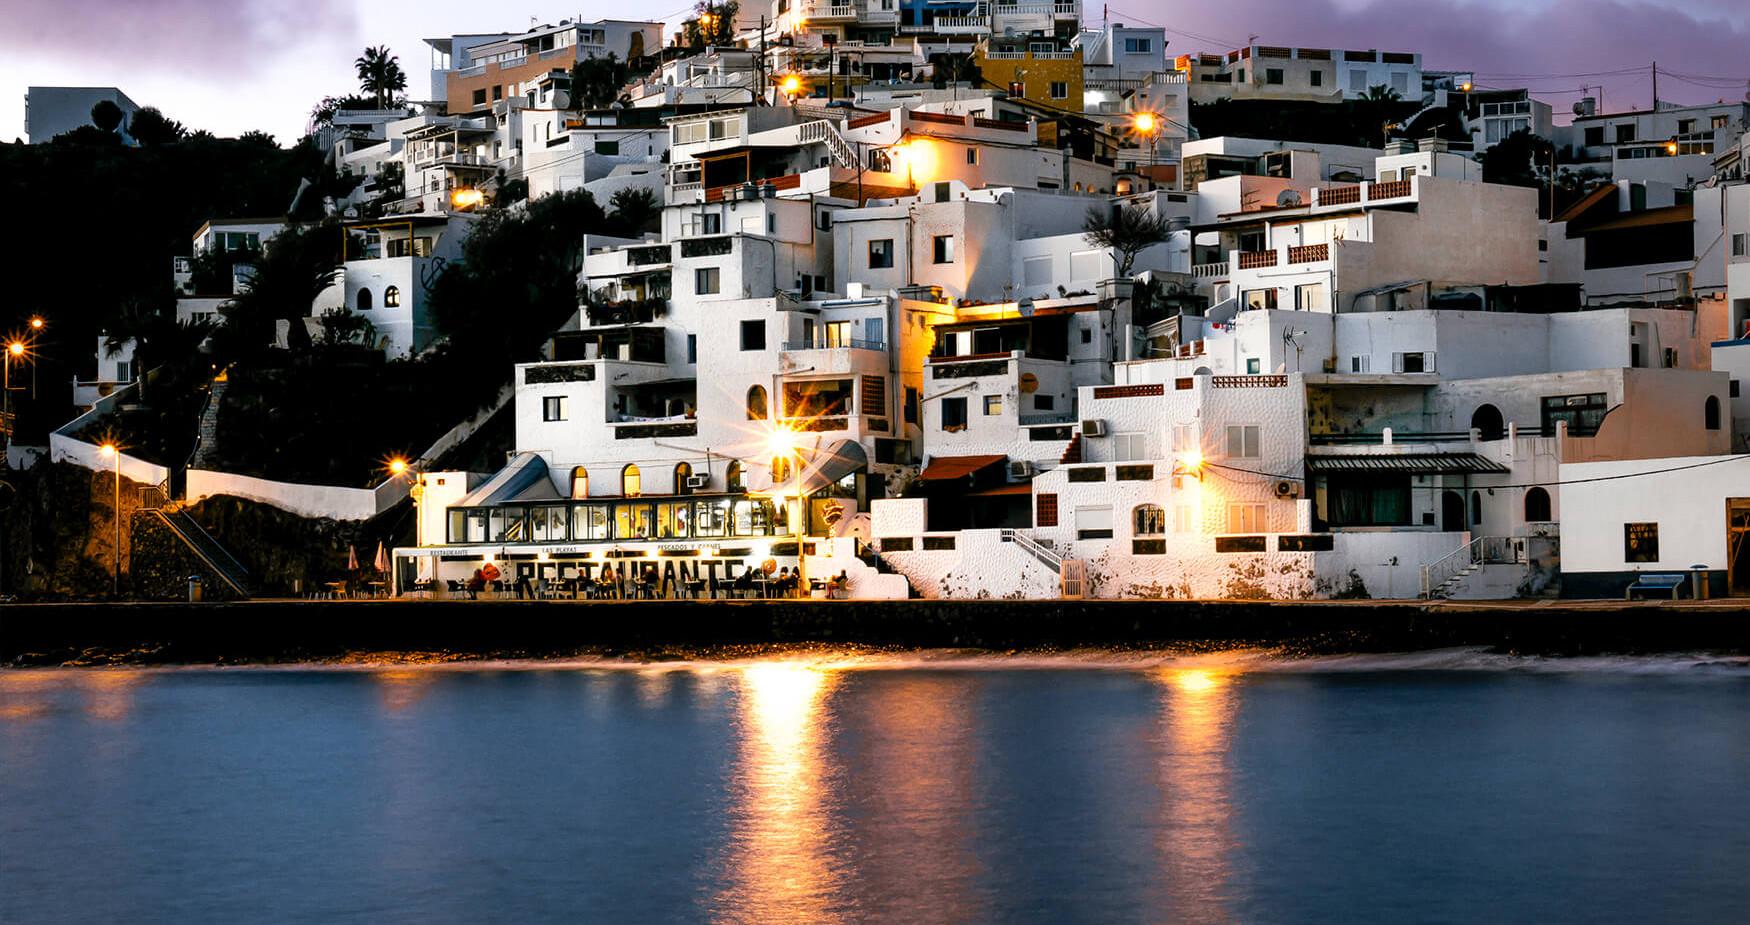 Spain - Fuerteventura